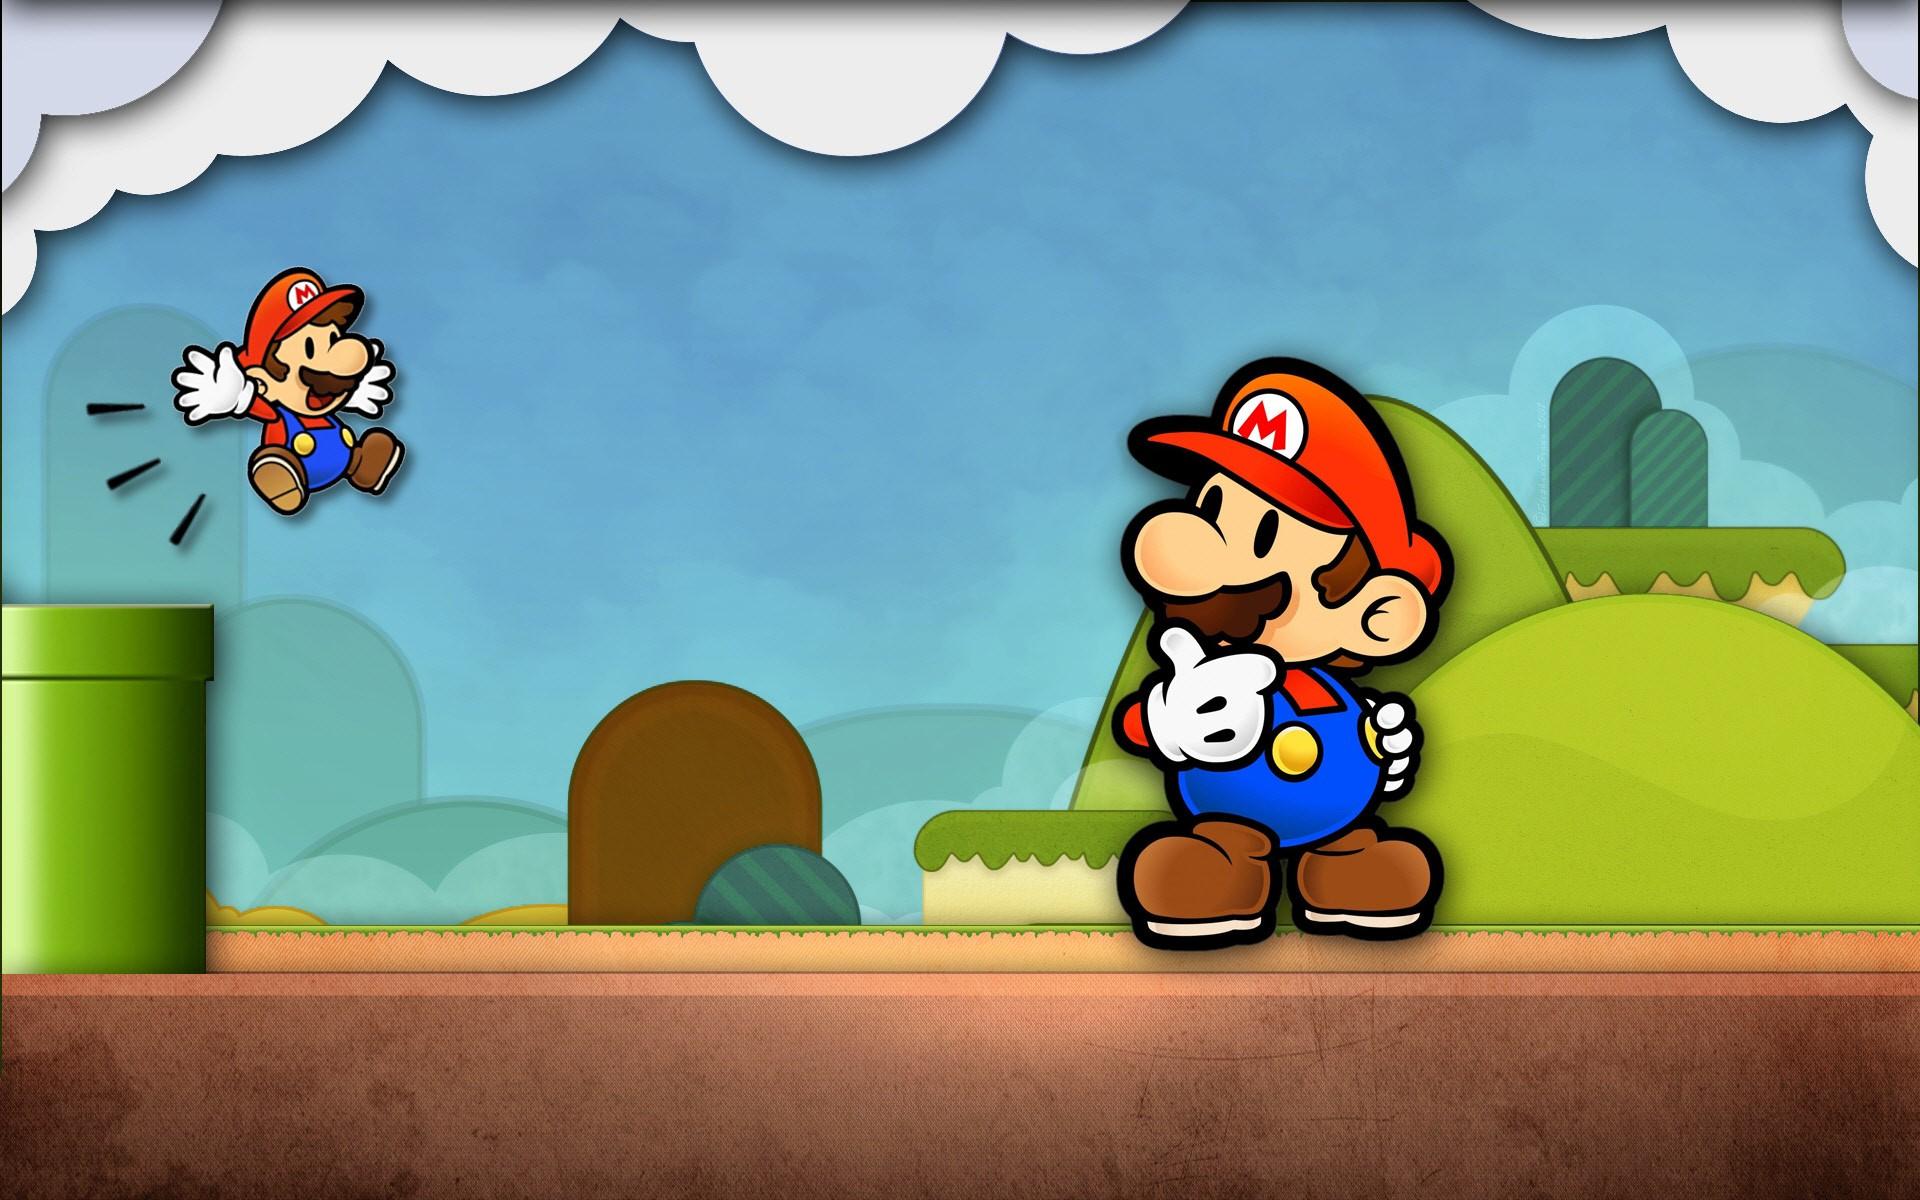 Abstract Computer Games Abstract Video Games Mario